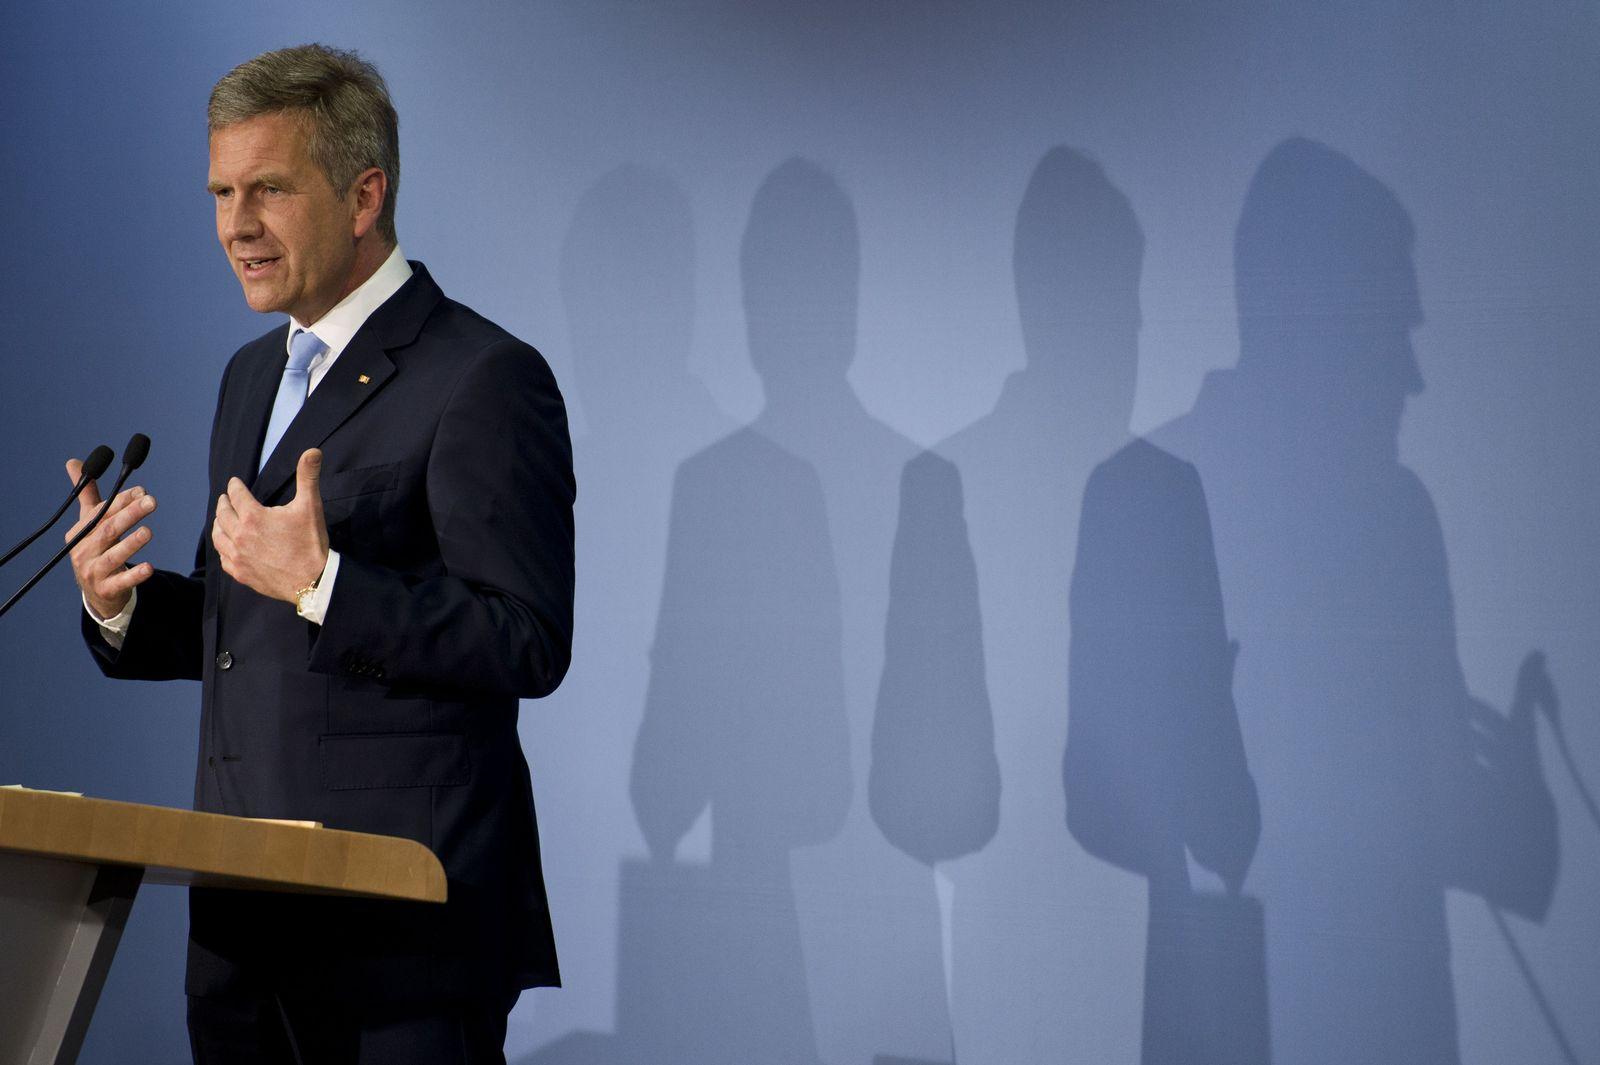 GERMANY-POLITICS-LITERATURE-WULFF